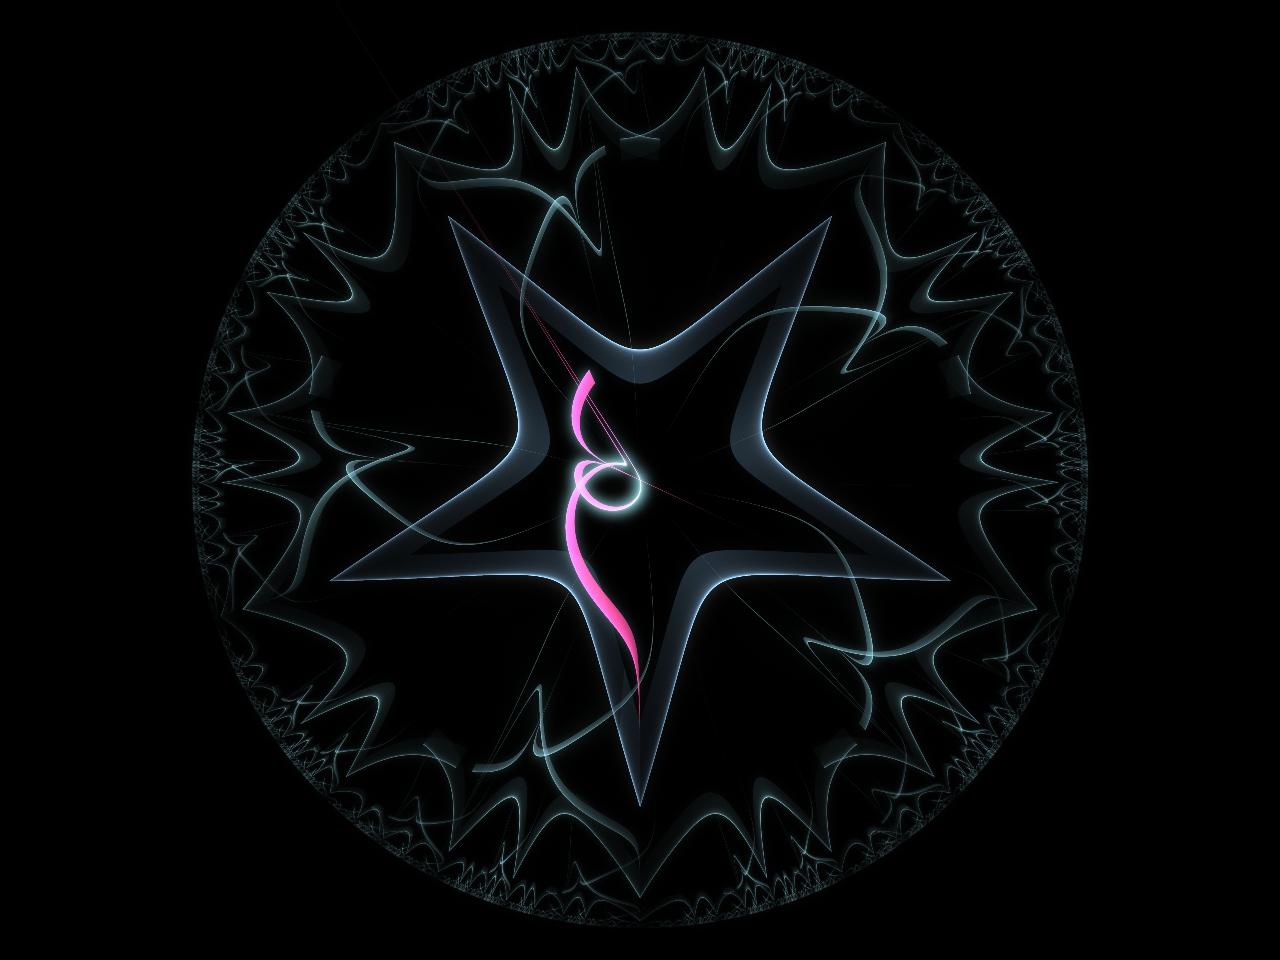 magick - air - invoke by tobaal